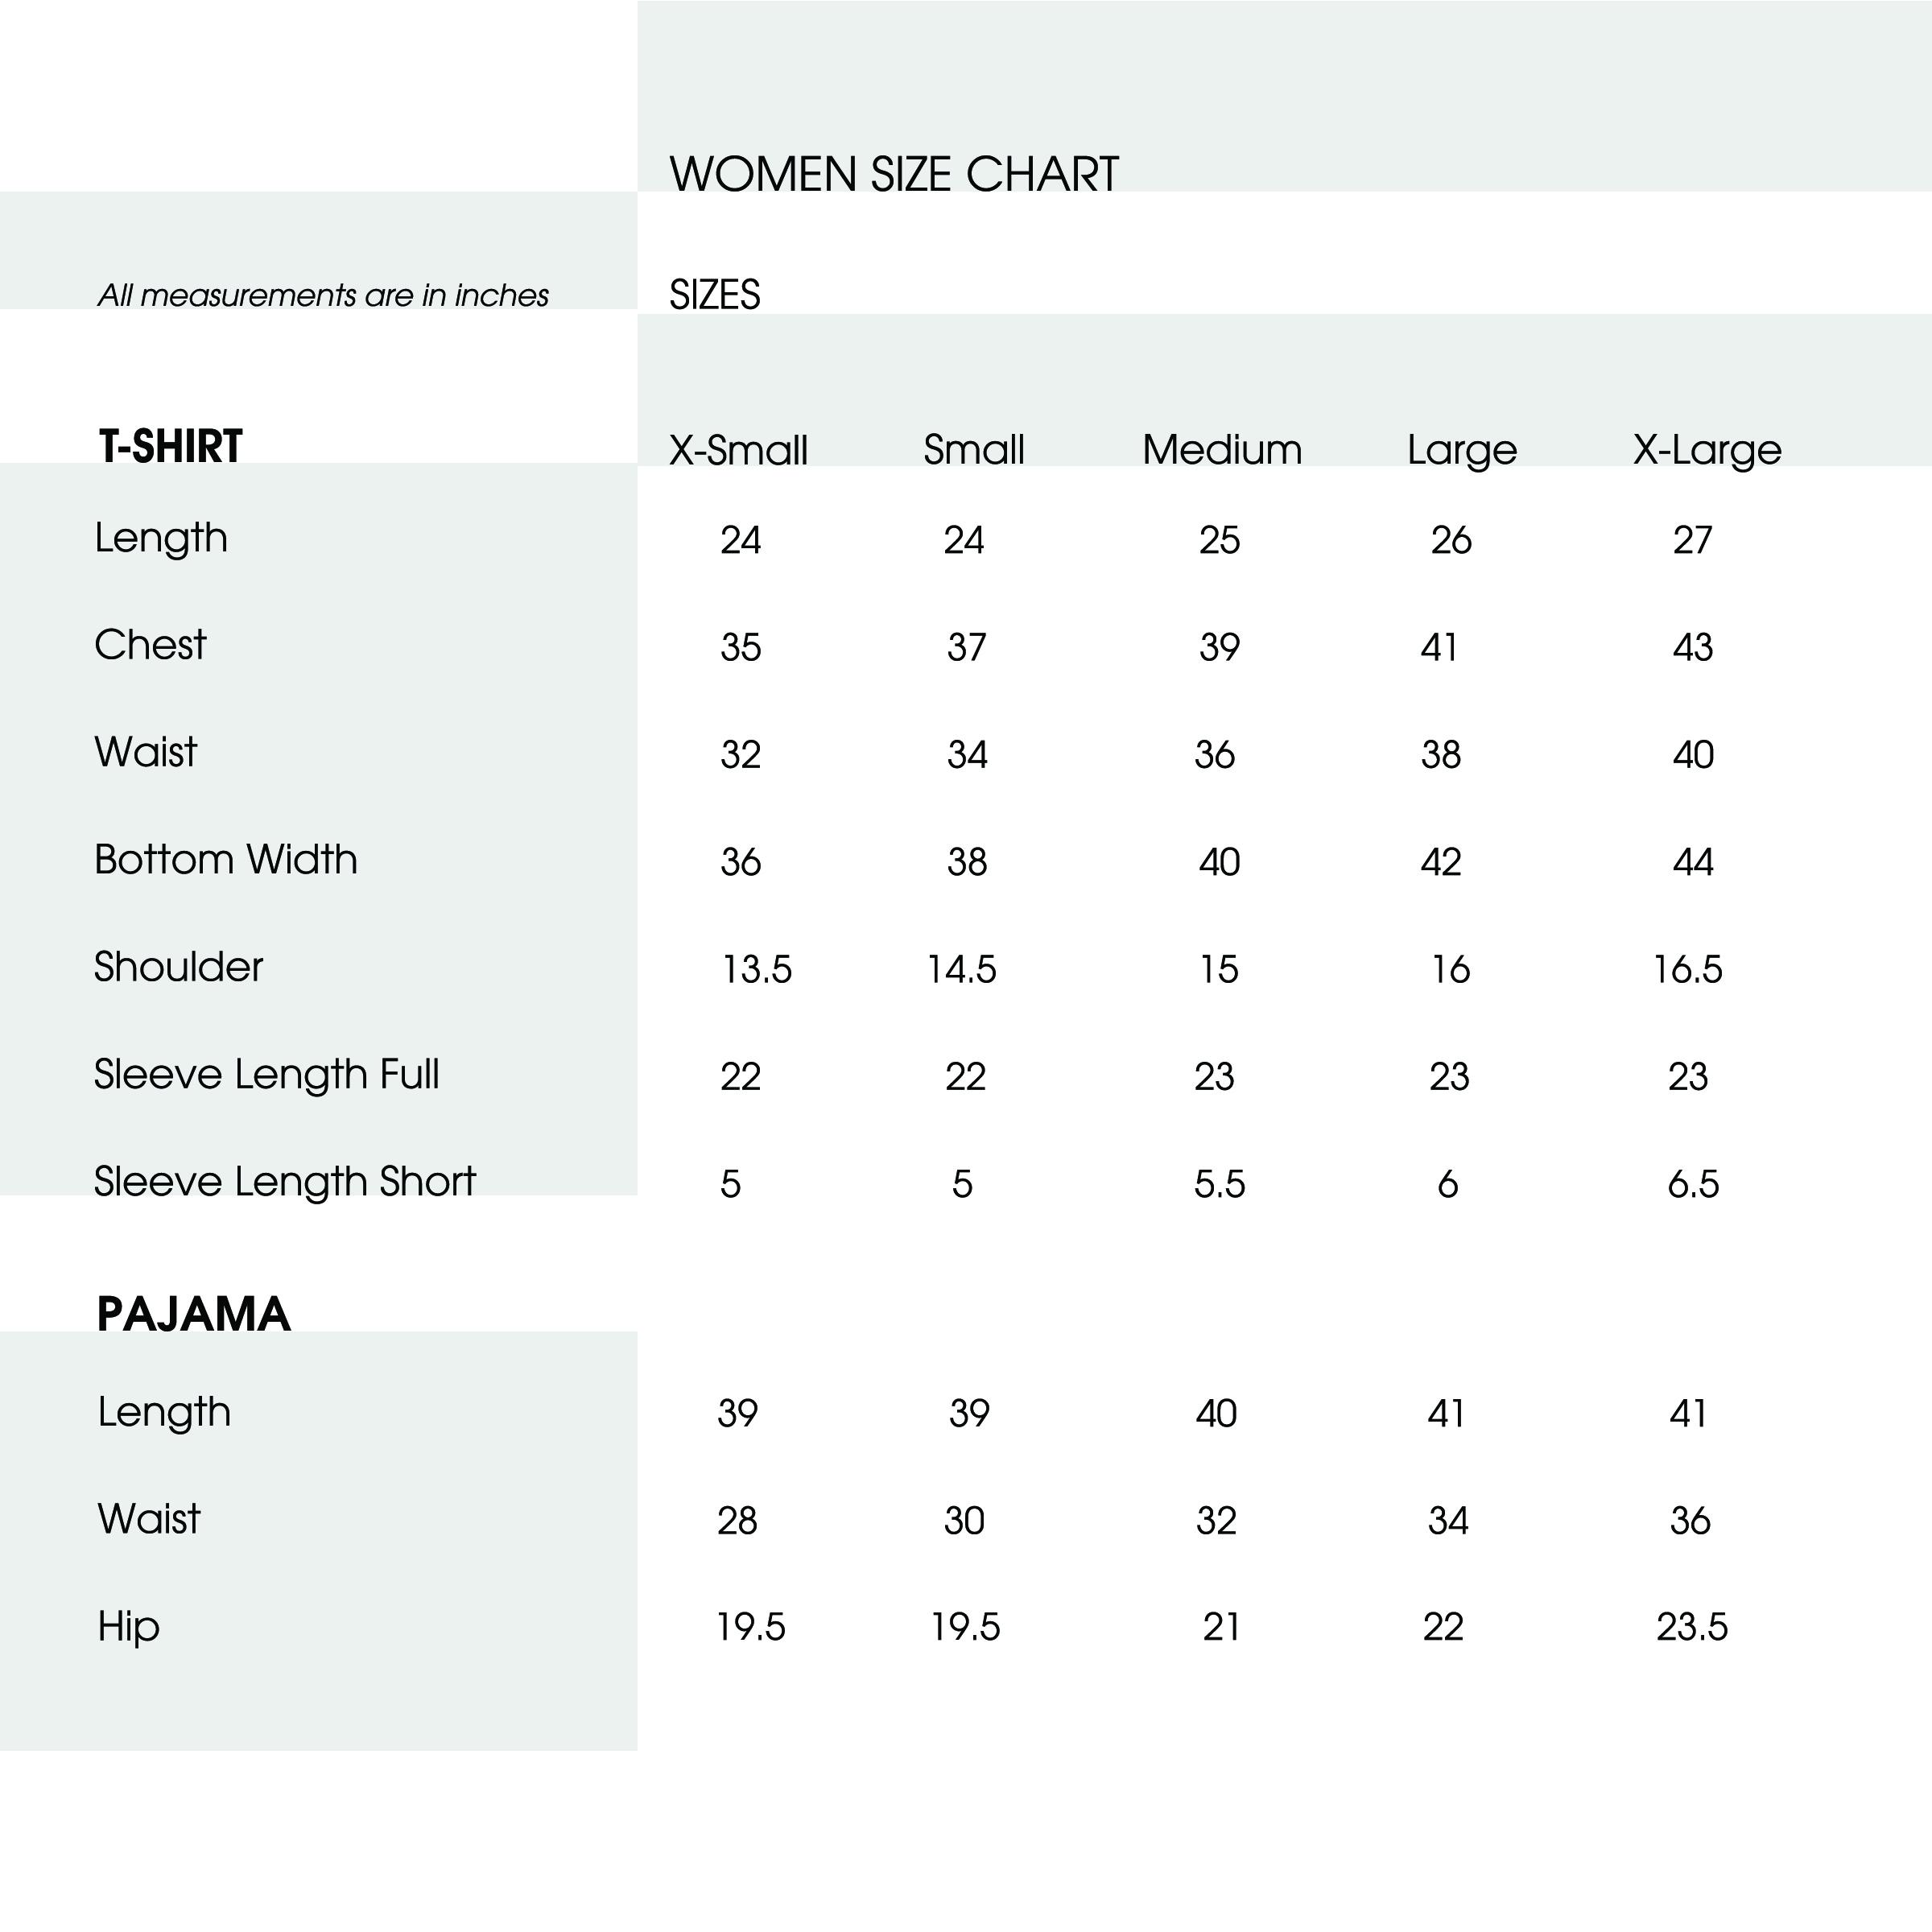 women-specs-sheet-website-jersey-fleece.jpg